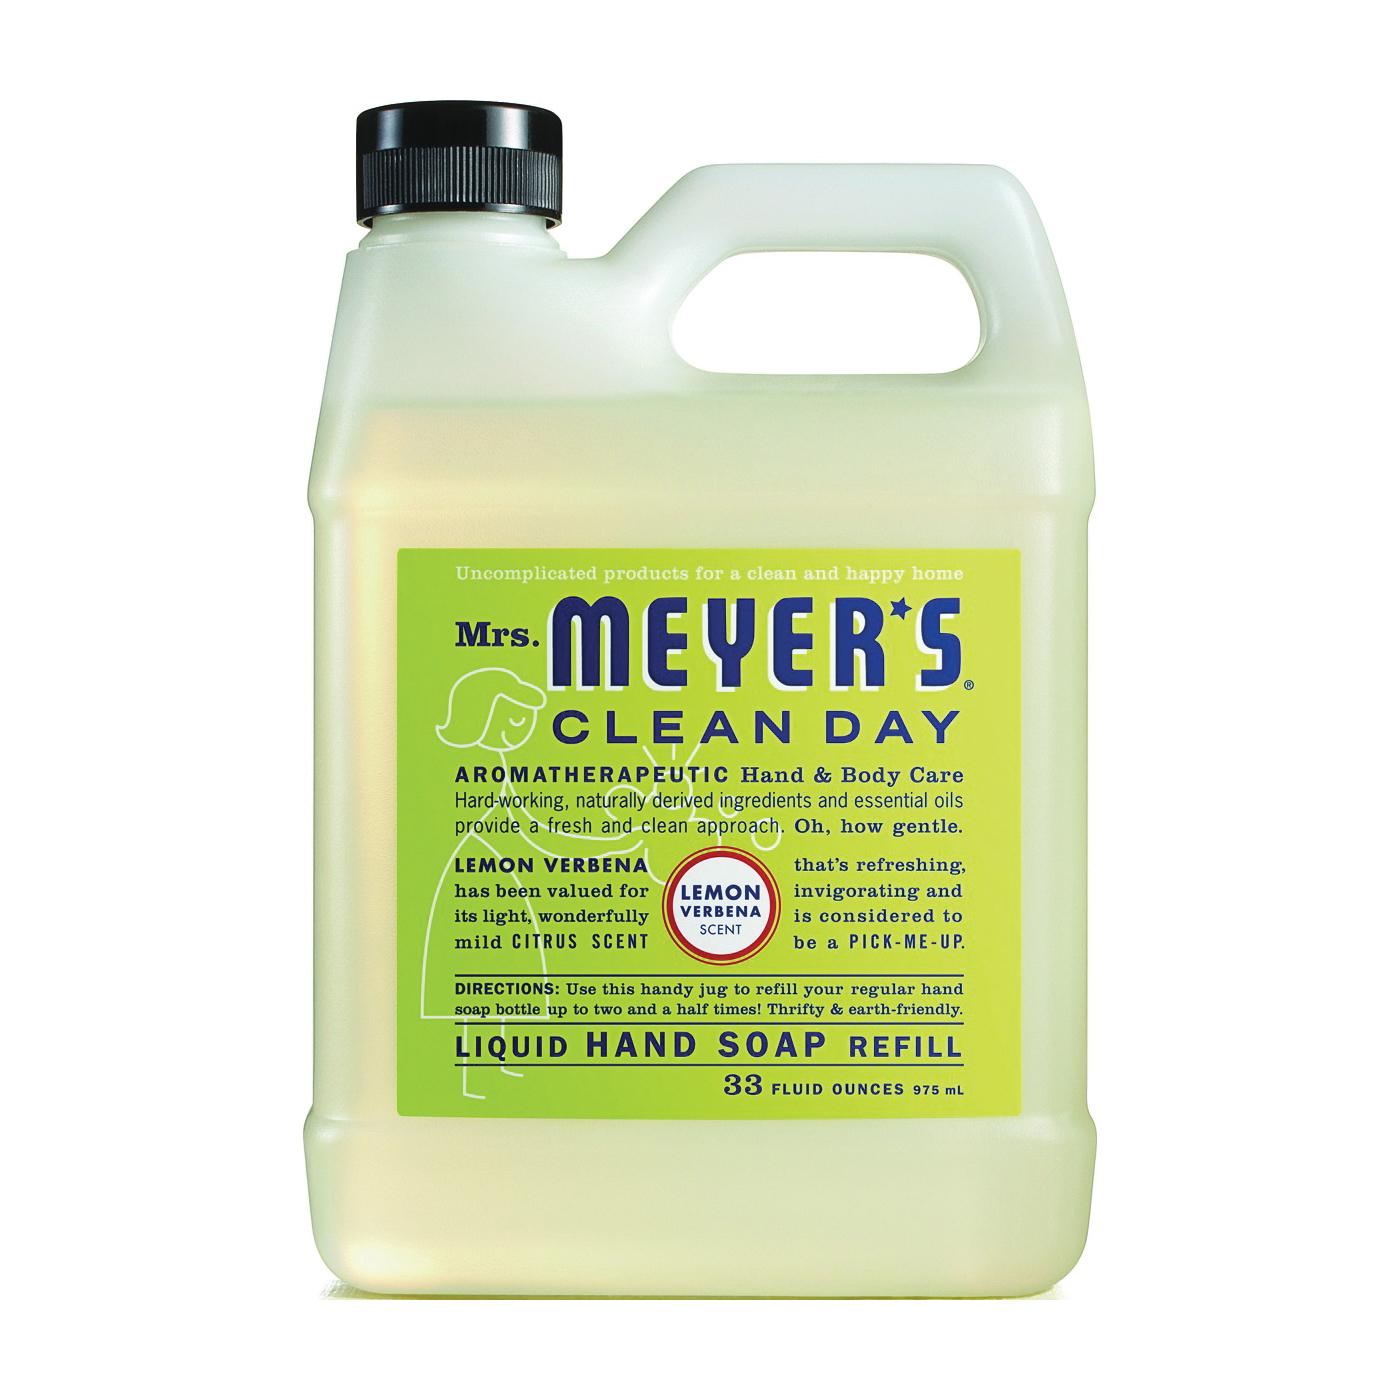 Picture of Mrs. Meyer's 12163 Hand Soap Refill, Liquid, Lemon Verbena, 33 oz Package, Jug